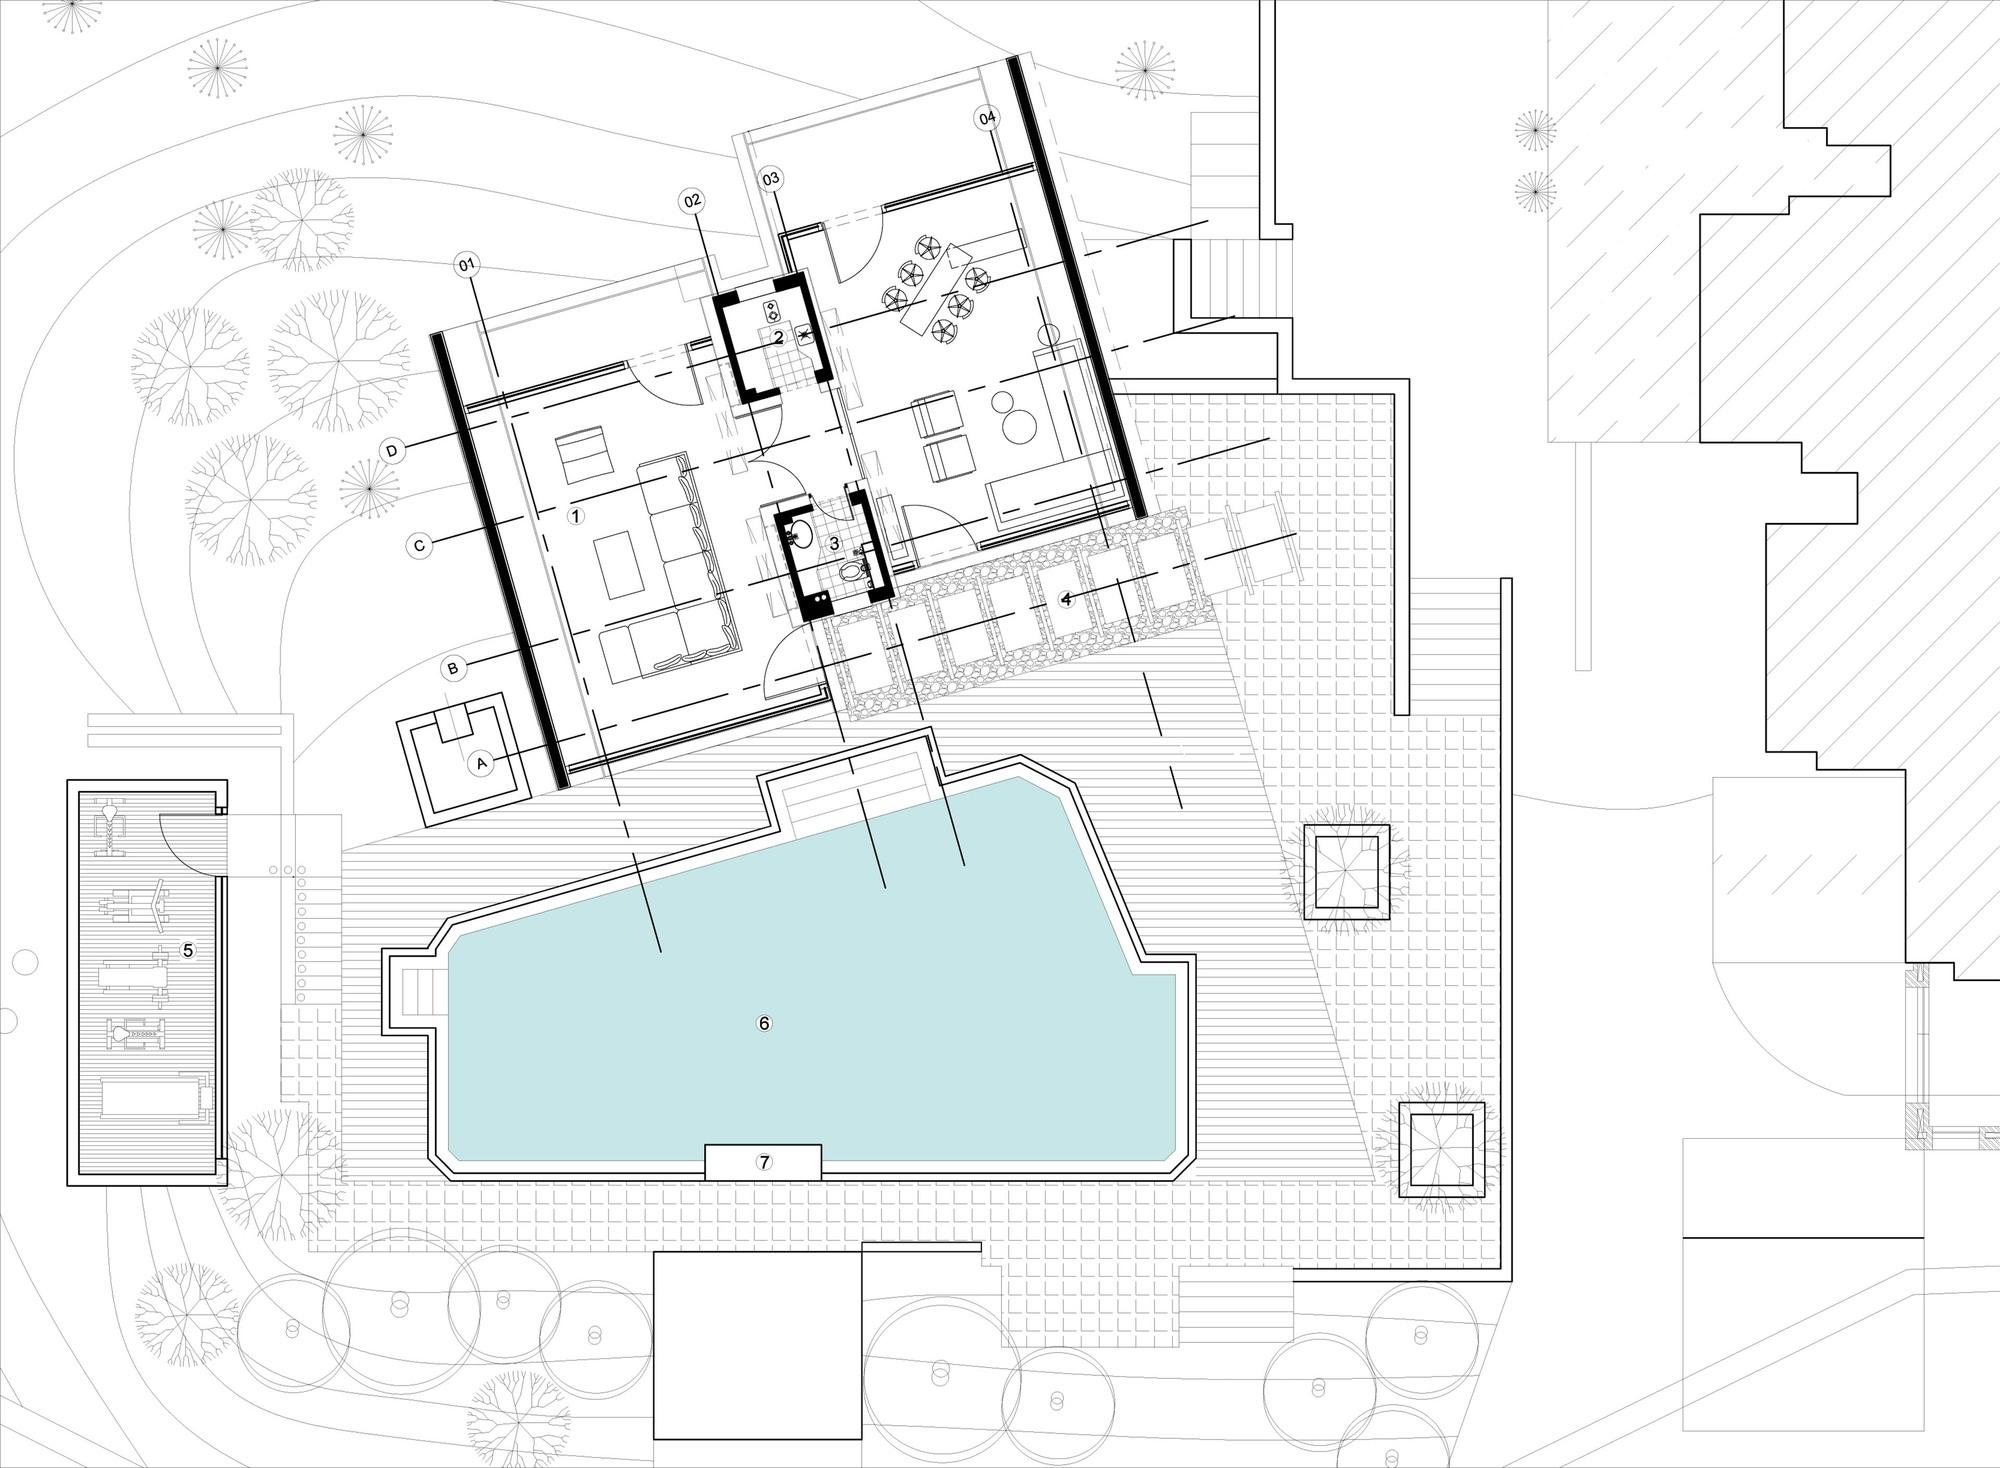 Ideal Site Plan